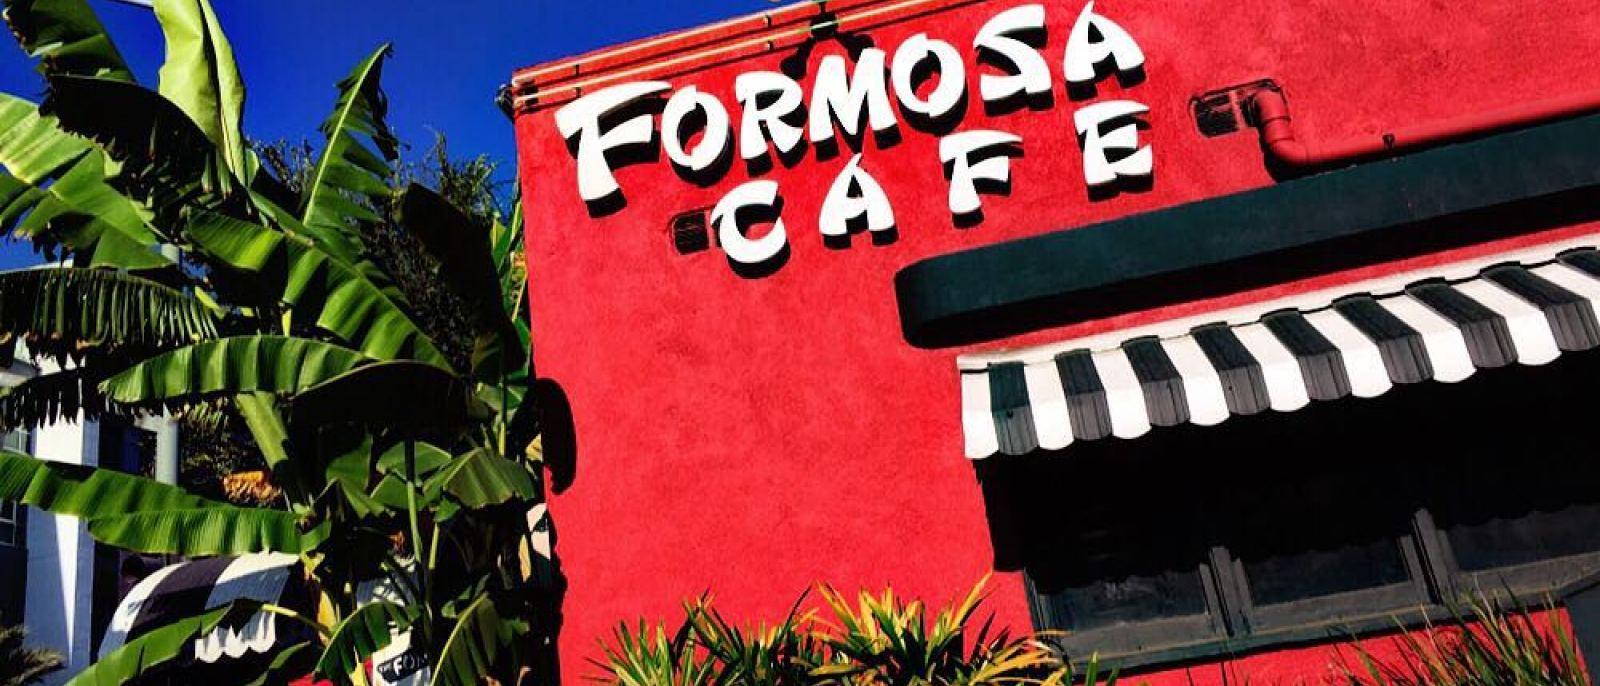 Formosa Cafe exterior sign